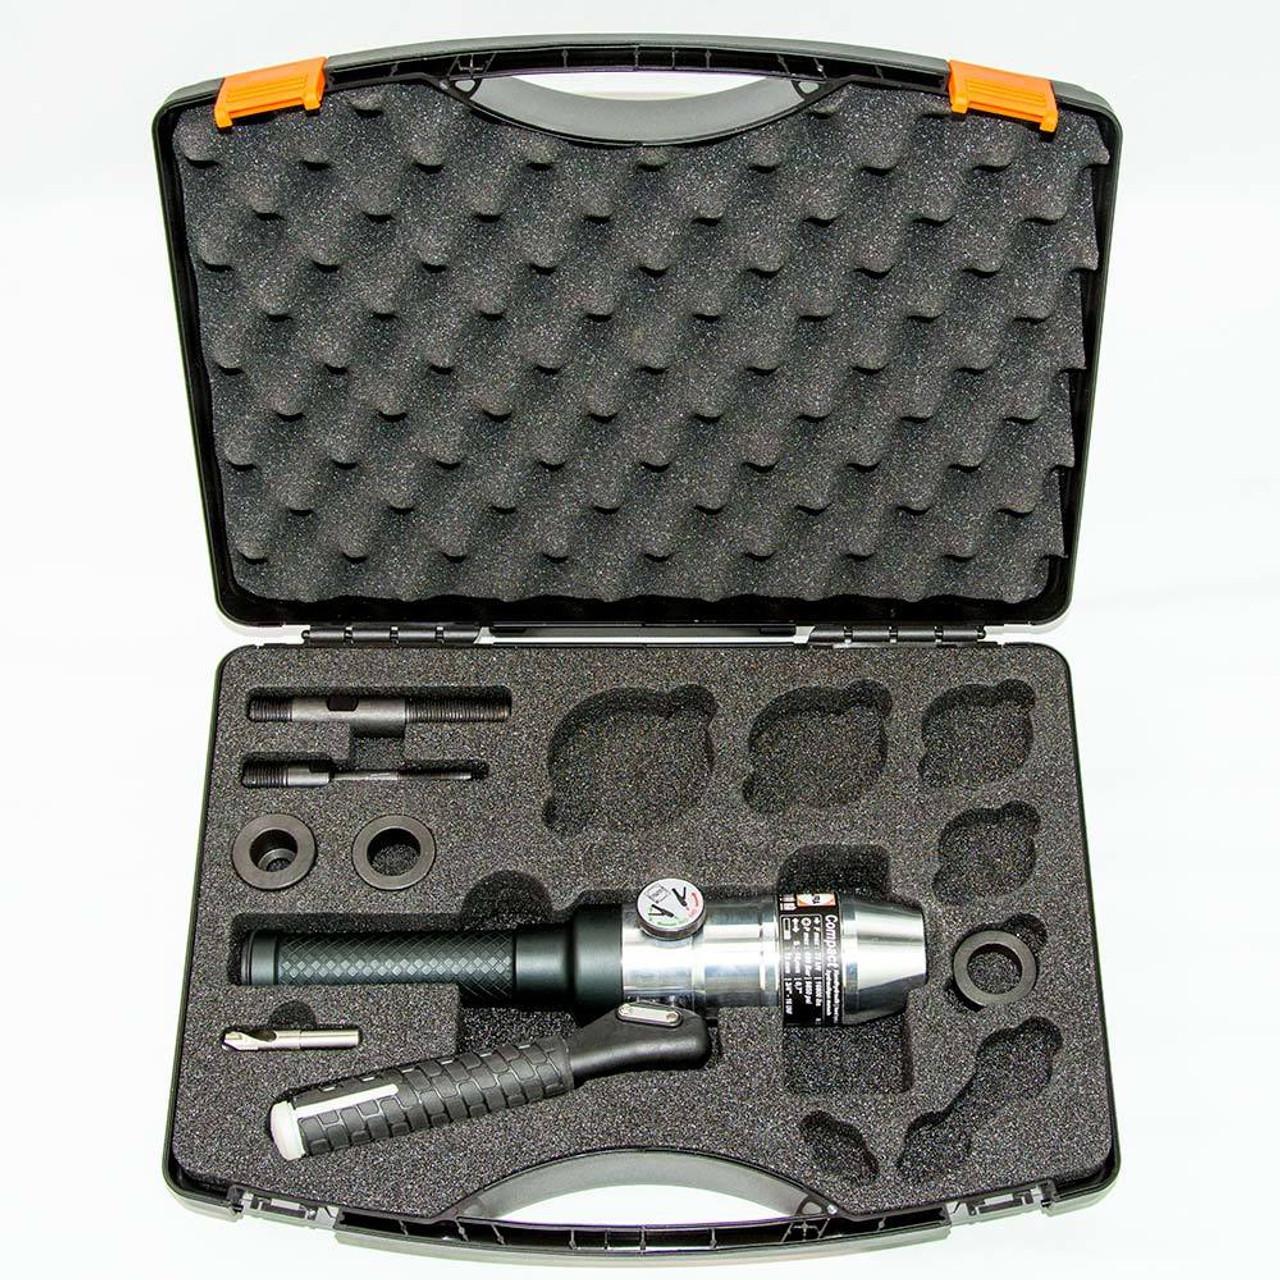 Alfra Compact Manual Straight Punching Tool Kit